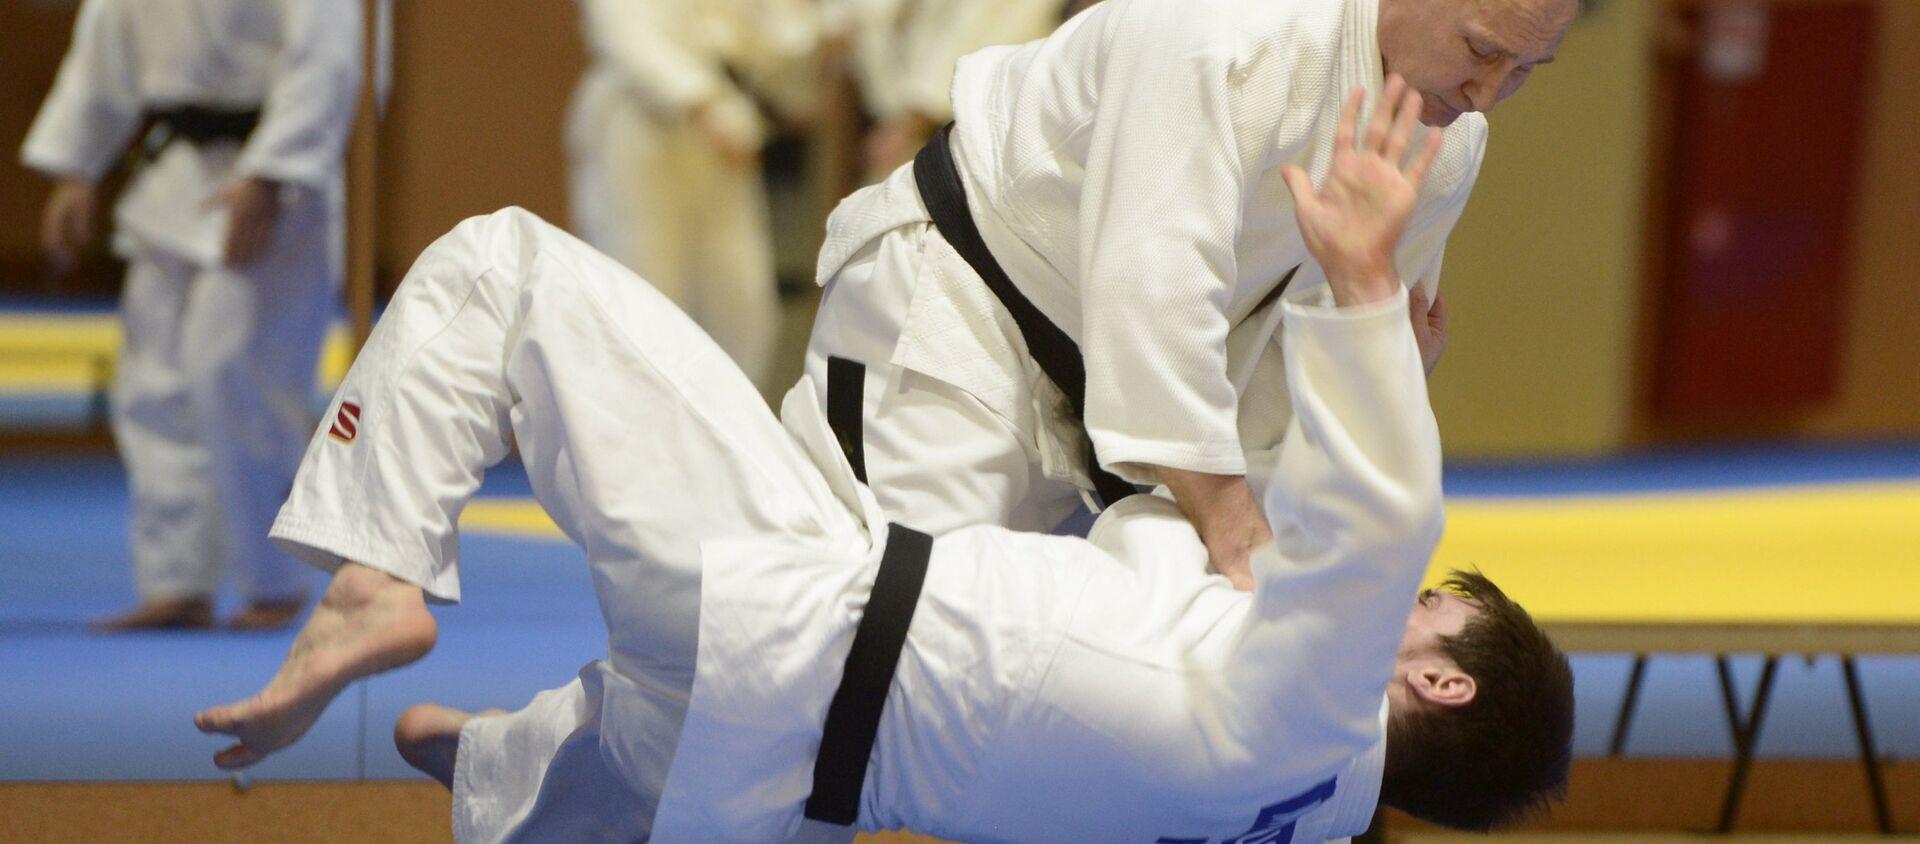 Vladímir Putin, presidente de Rusia, practicando judo - Sputnik Mundo, 1920, 28.10.2020